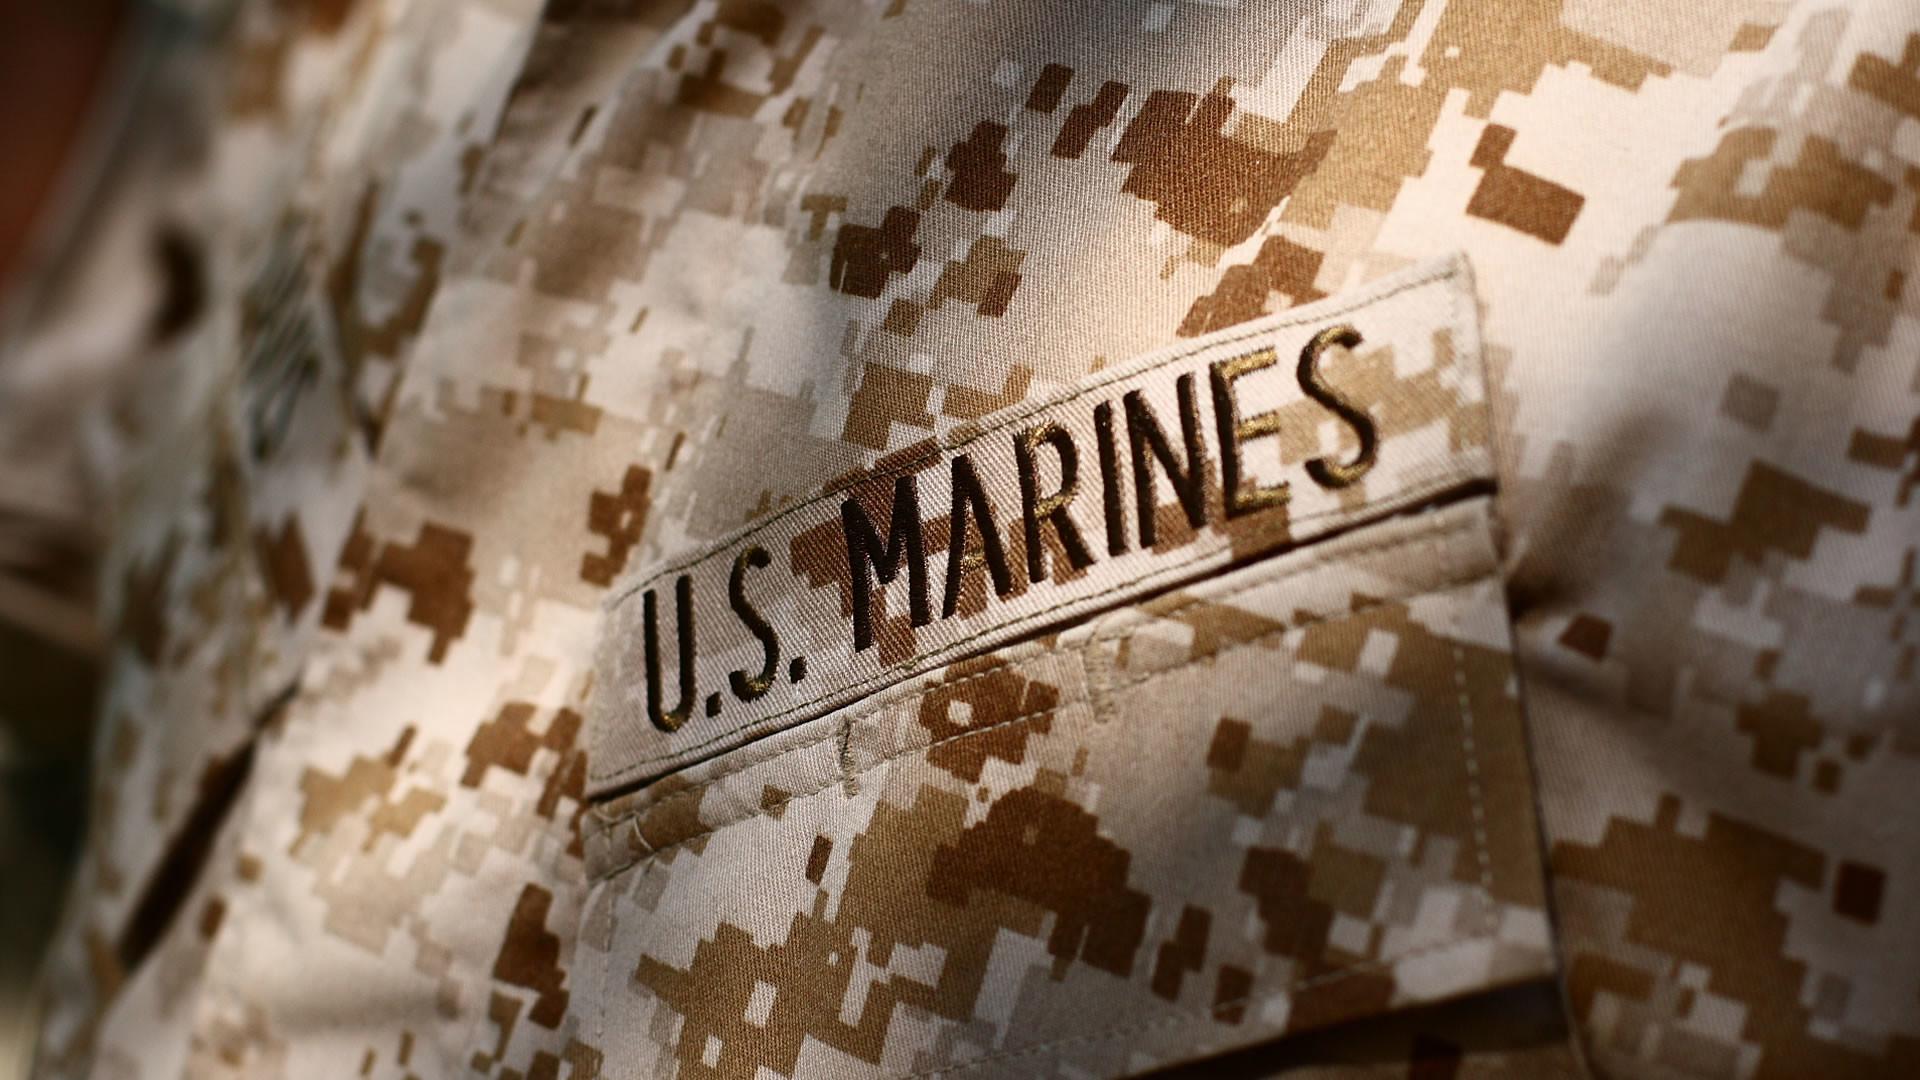 US Marines Uniform Patch